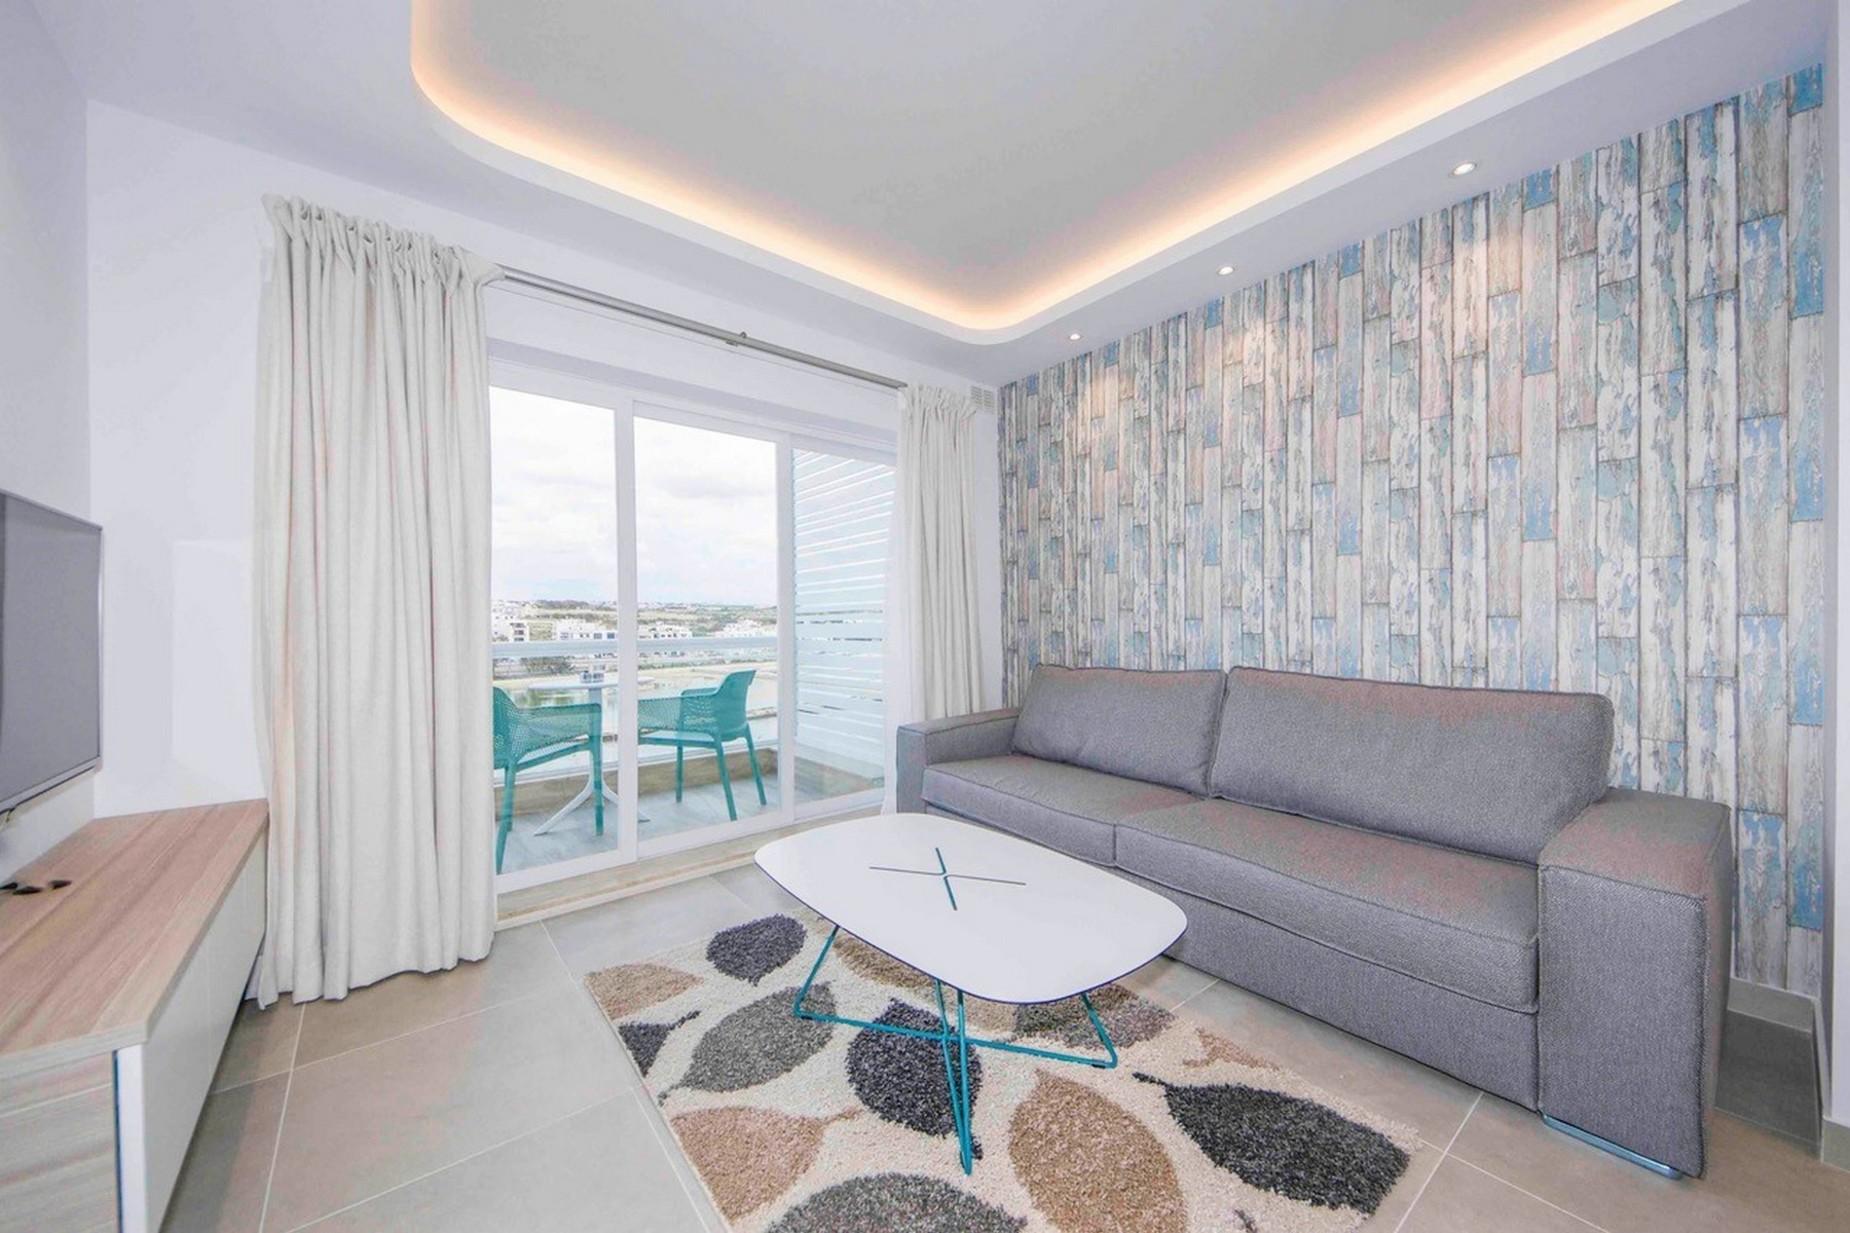 2 bed Apartment For Rent in Qawra, Qawra - thumb 3